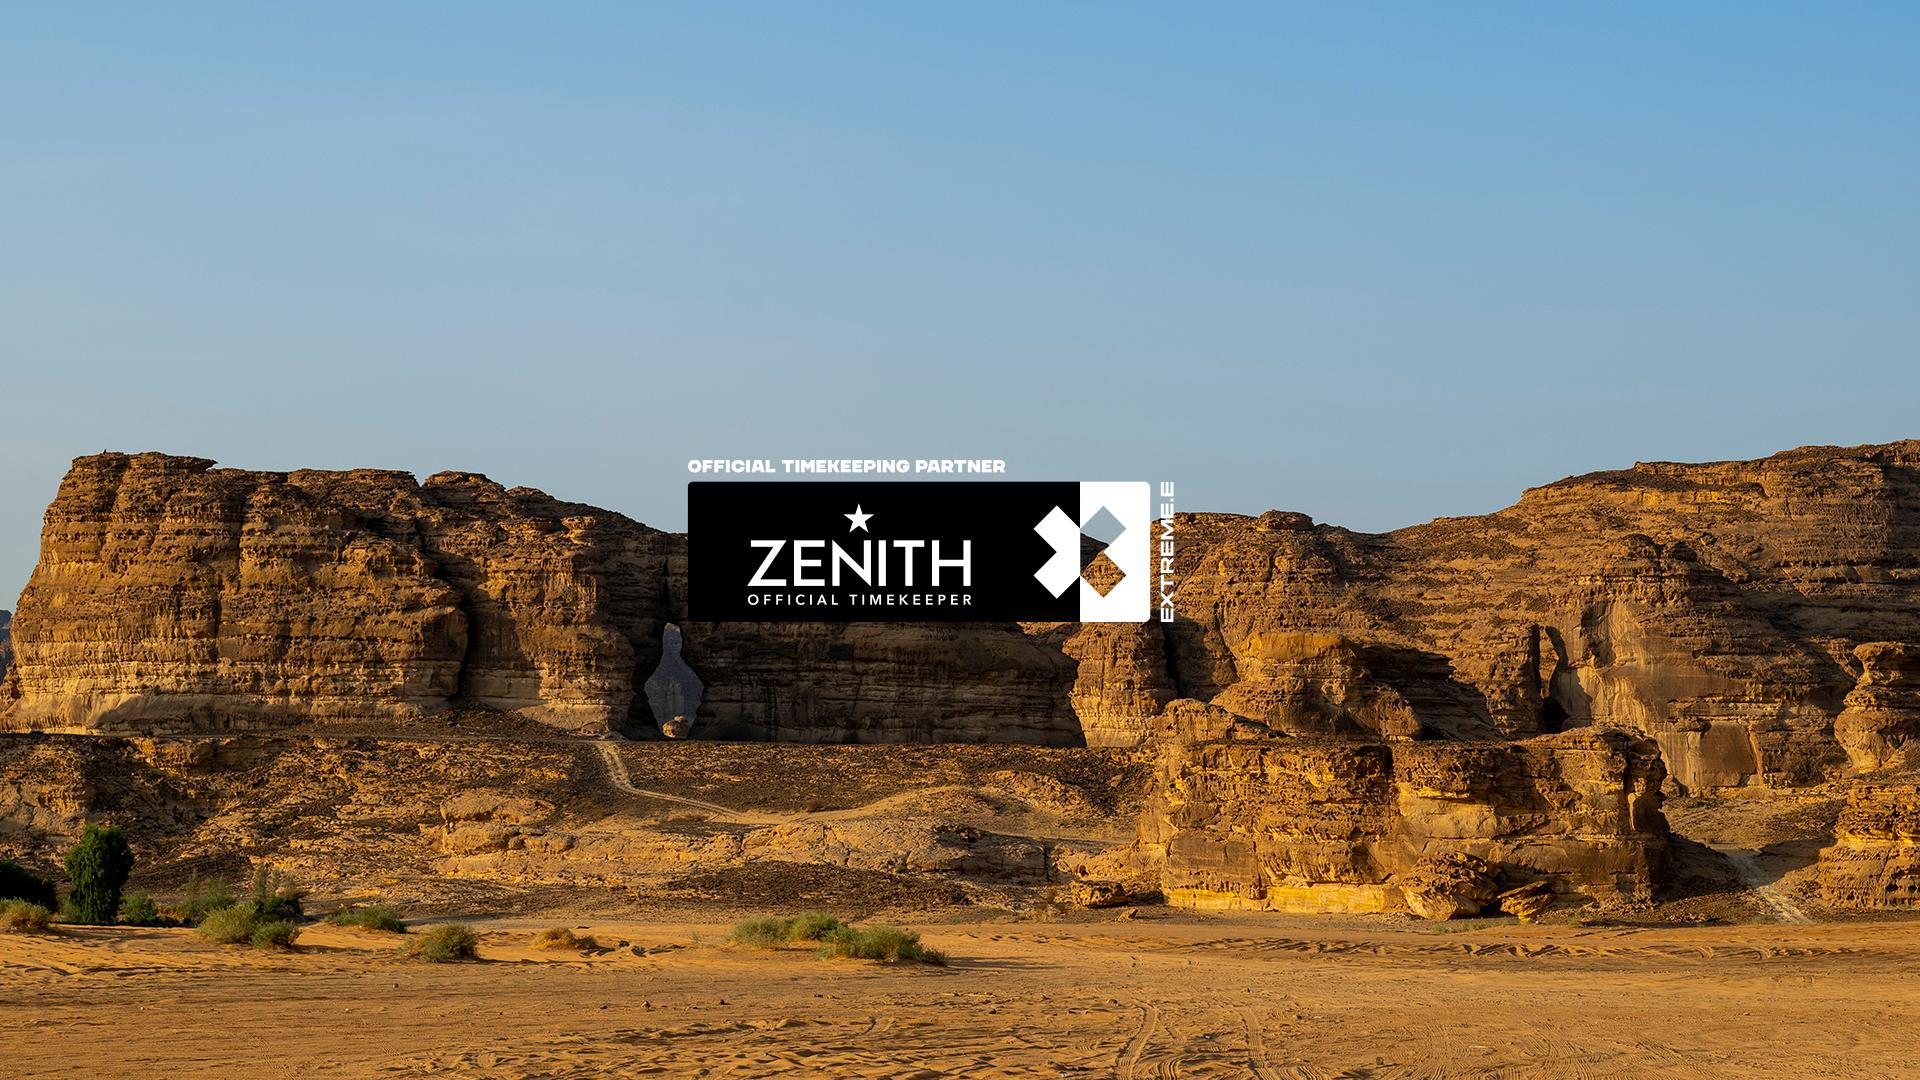 ZENITH_EXTREME-E_OFFICIAL TIMEKEEPER_LOGO